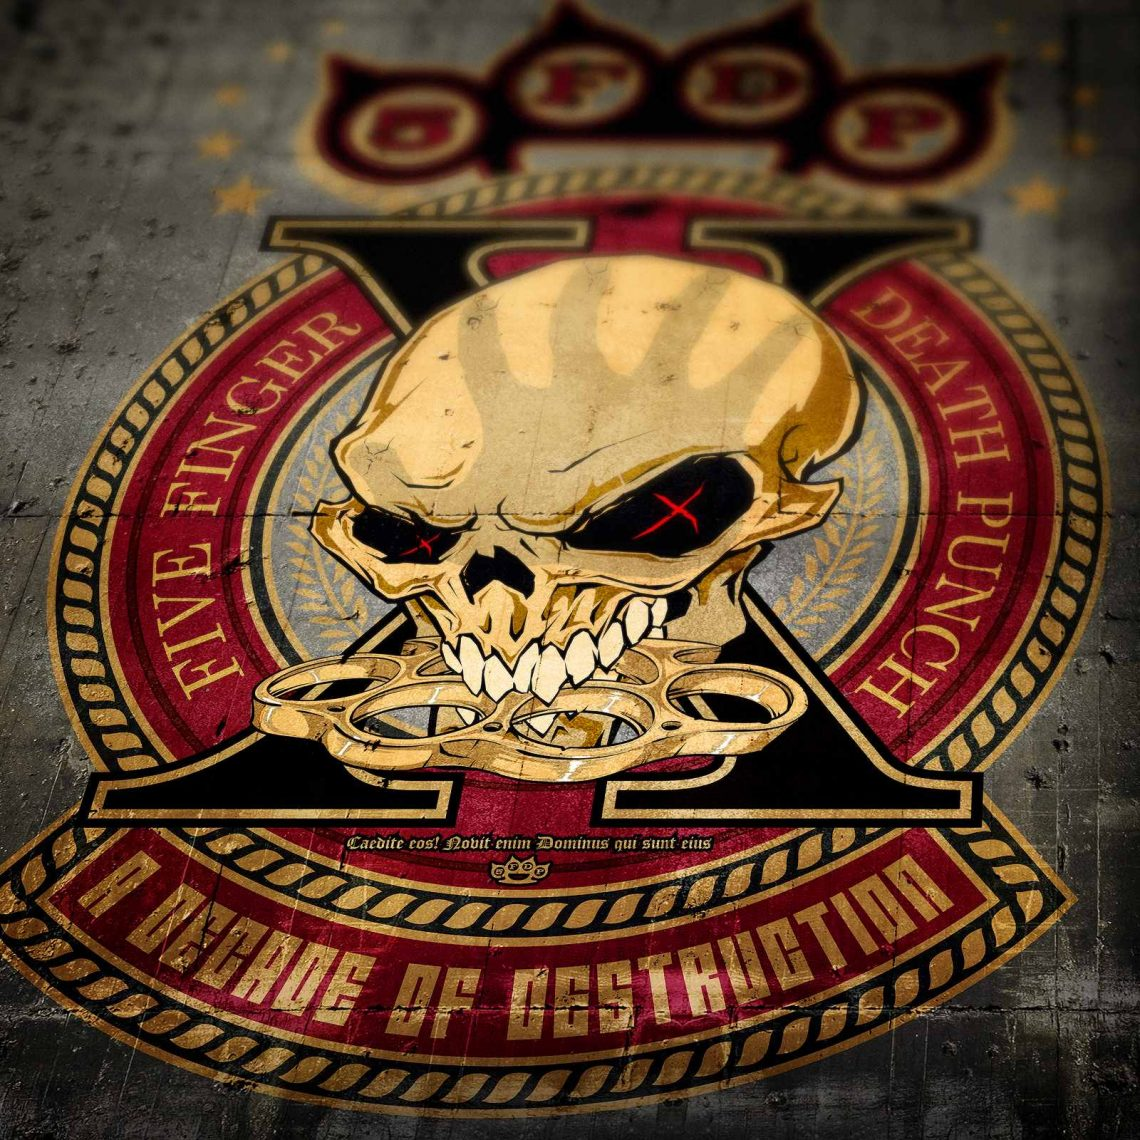 Five Finger Death Punch- A Decade Of Destruction